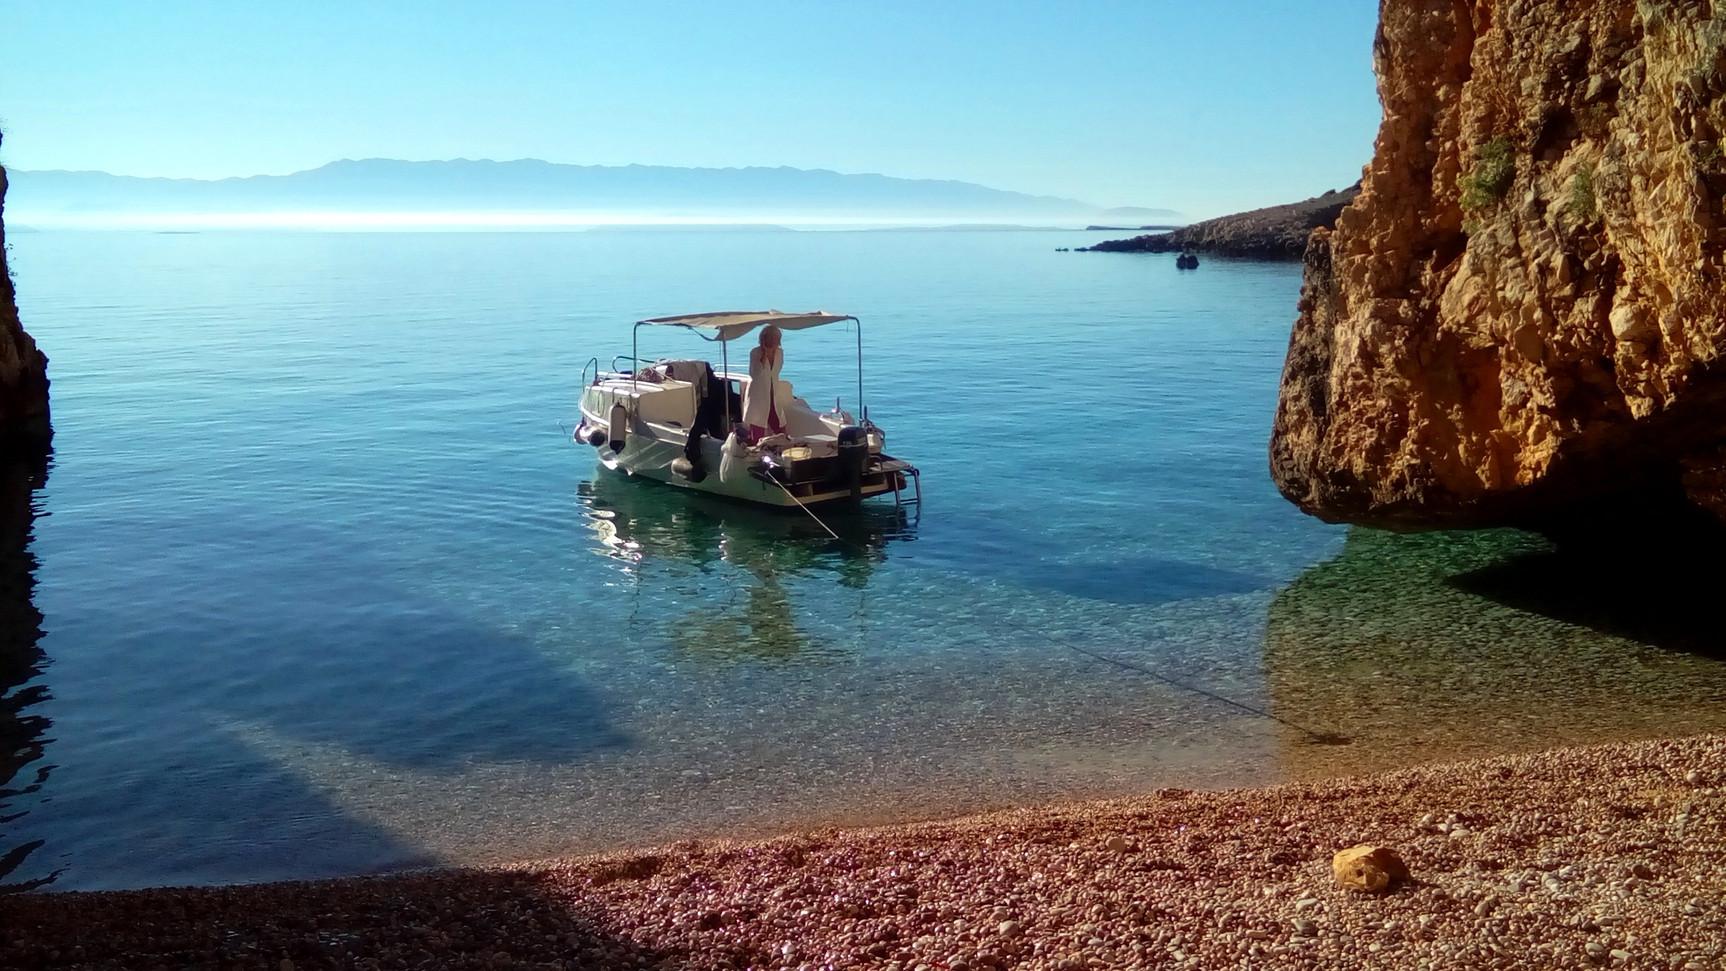 plavnik small beach 1